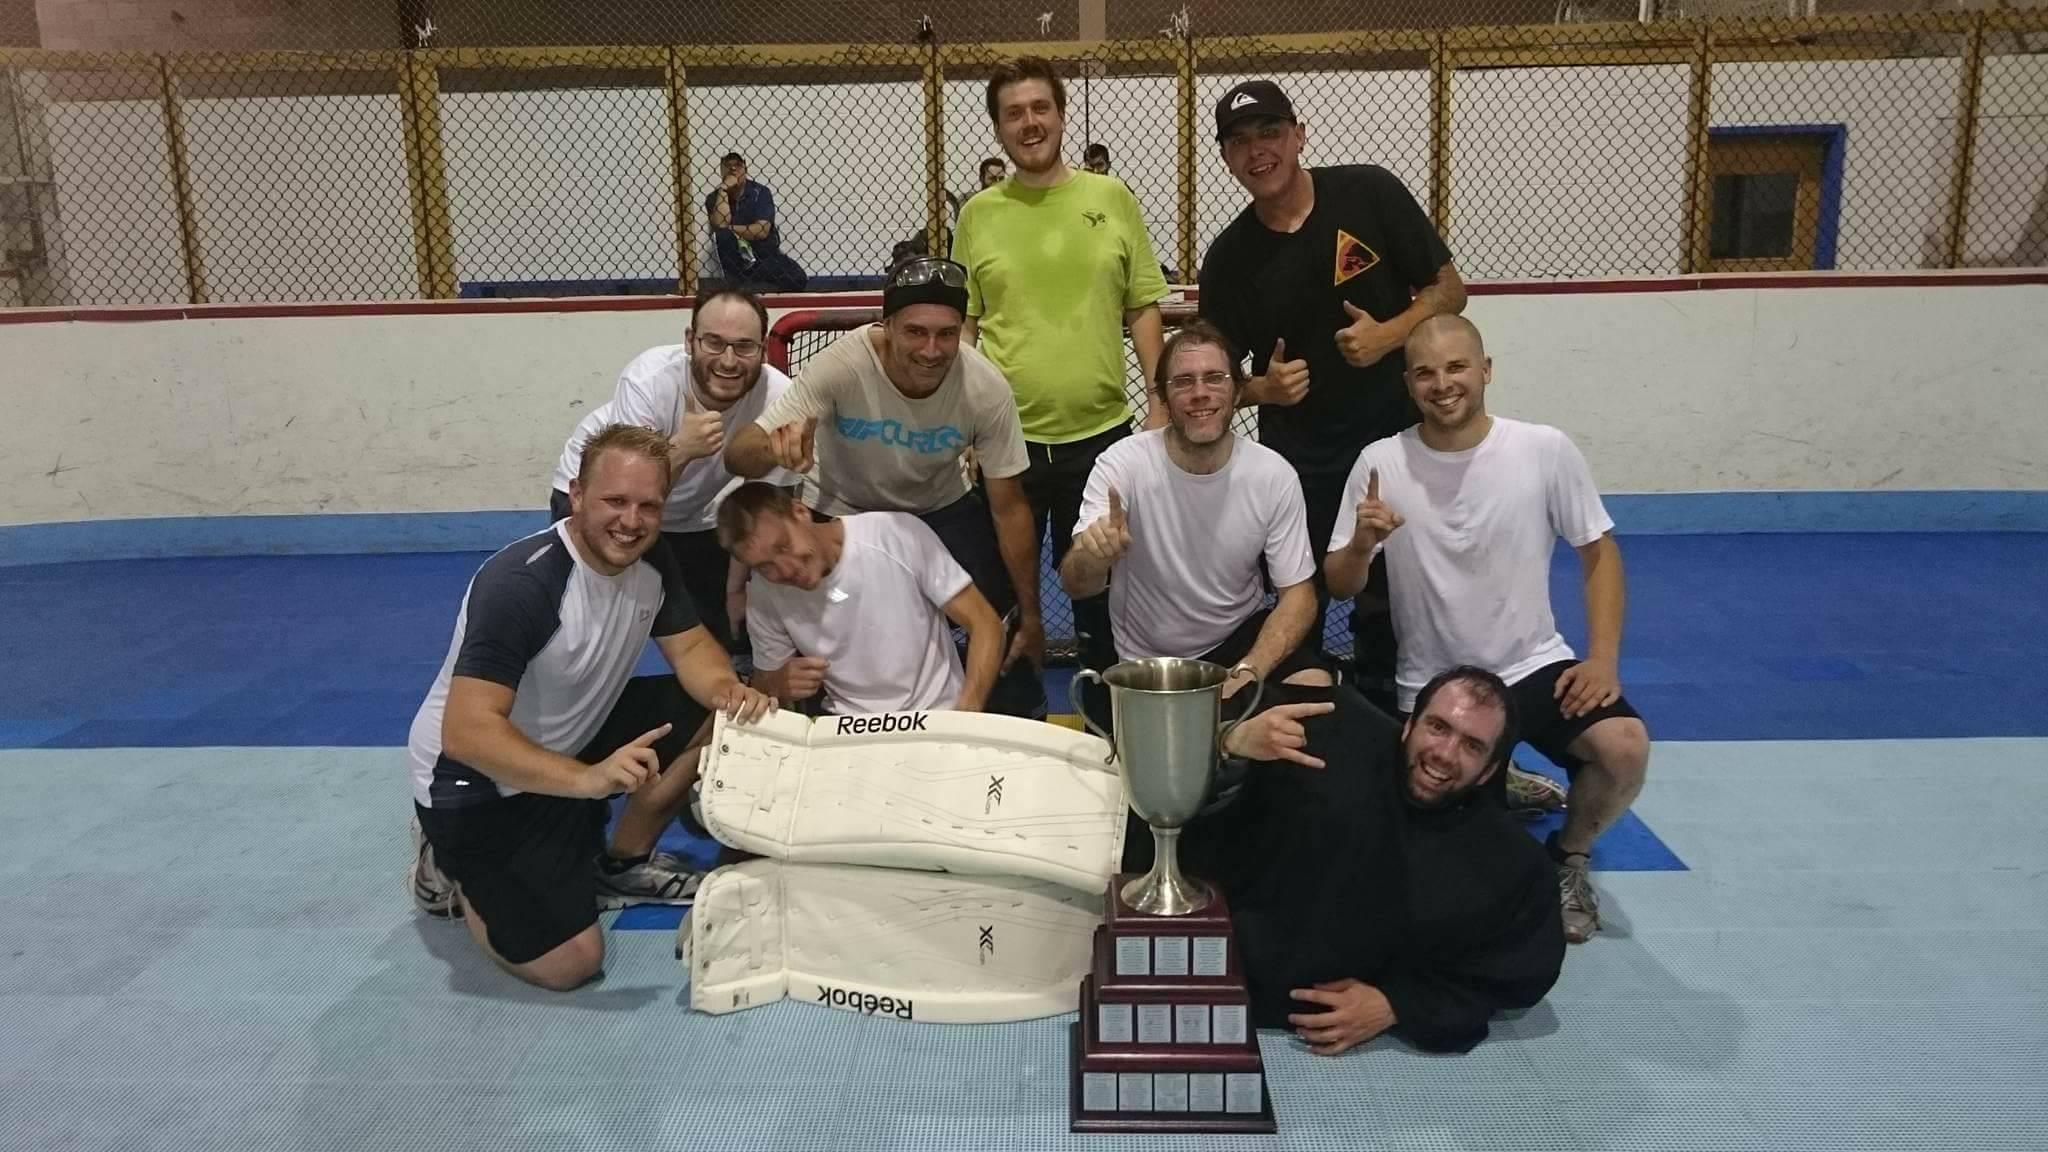 Champions_hockey_cosom_hockey_balle_printemps_2017